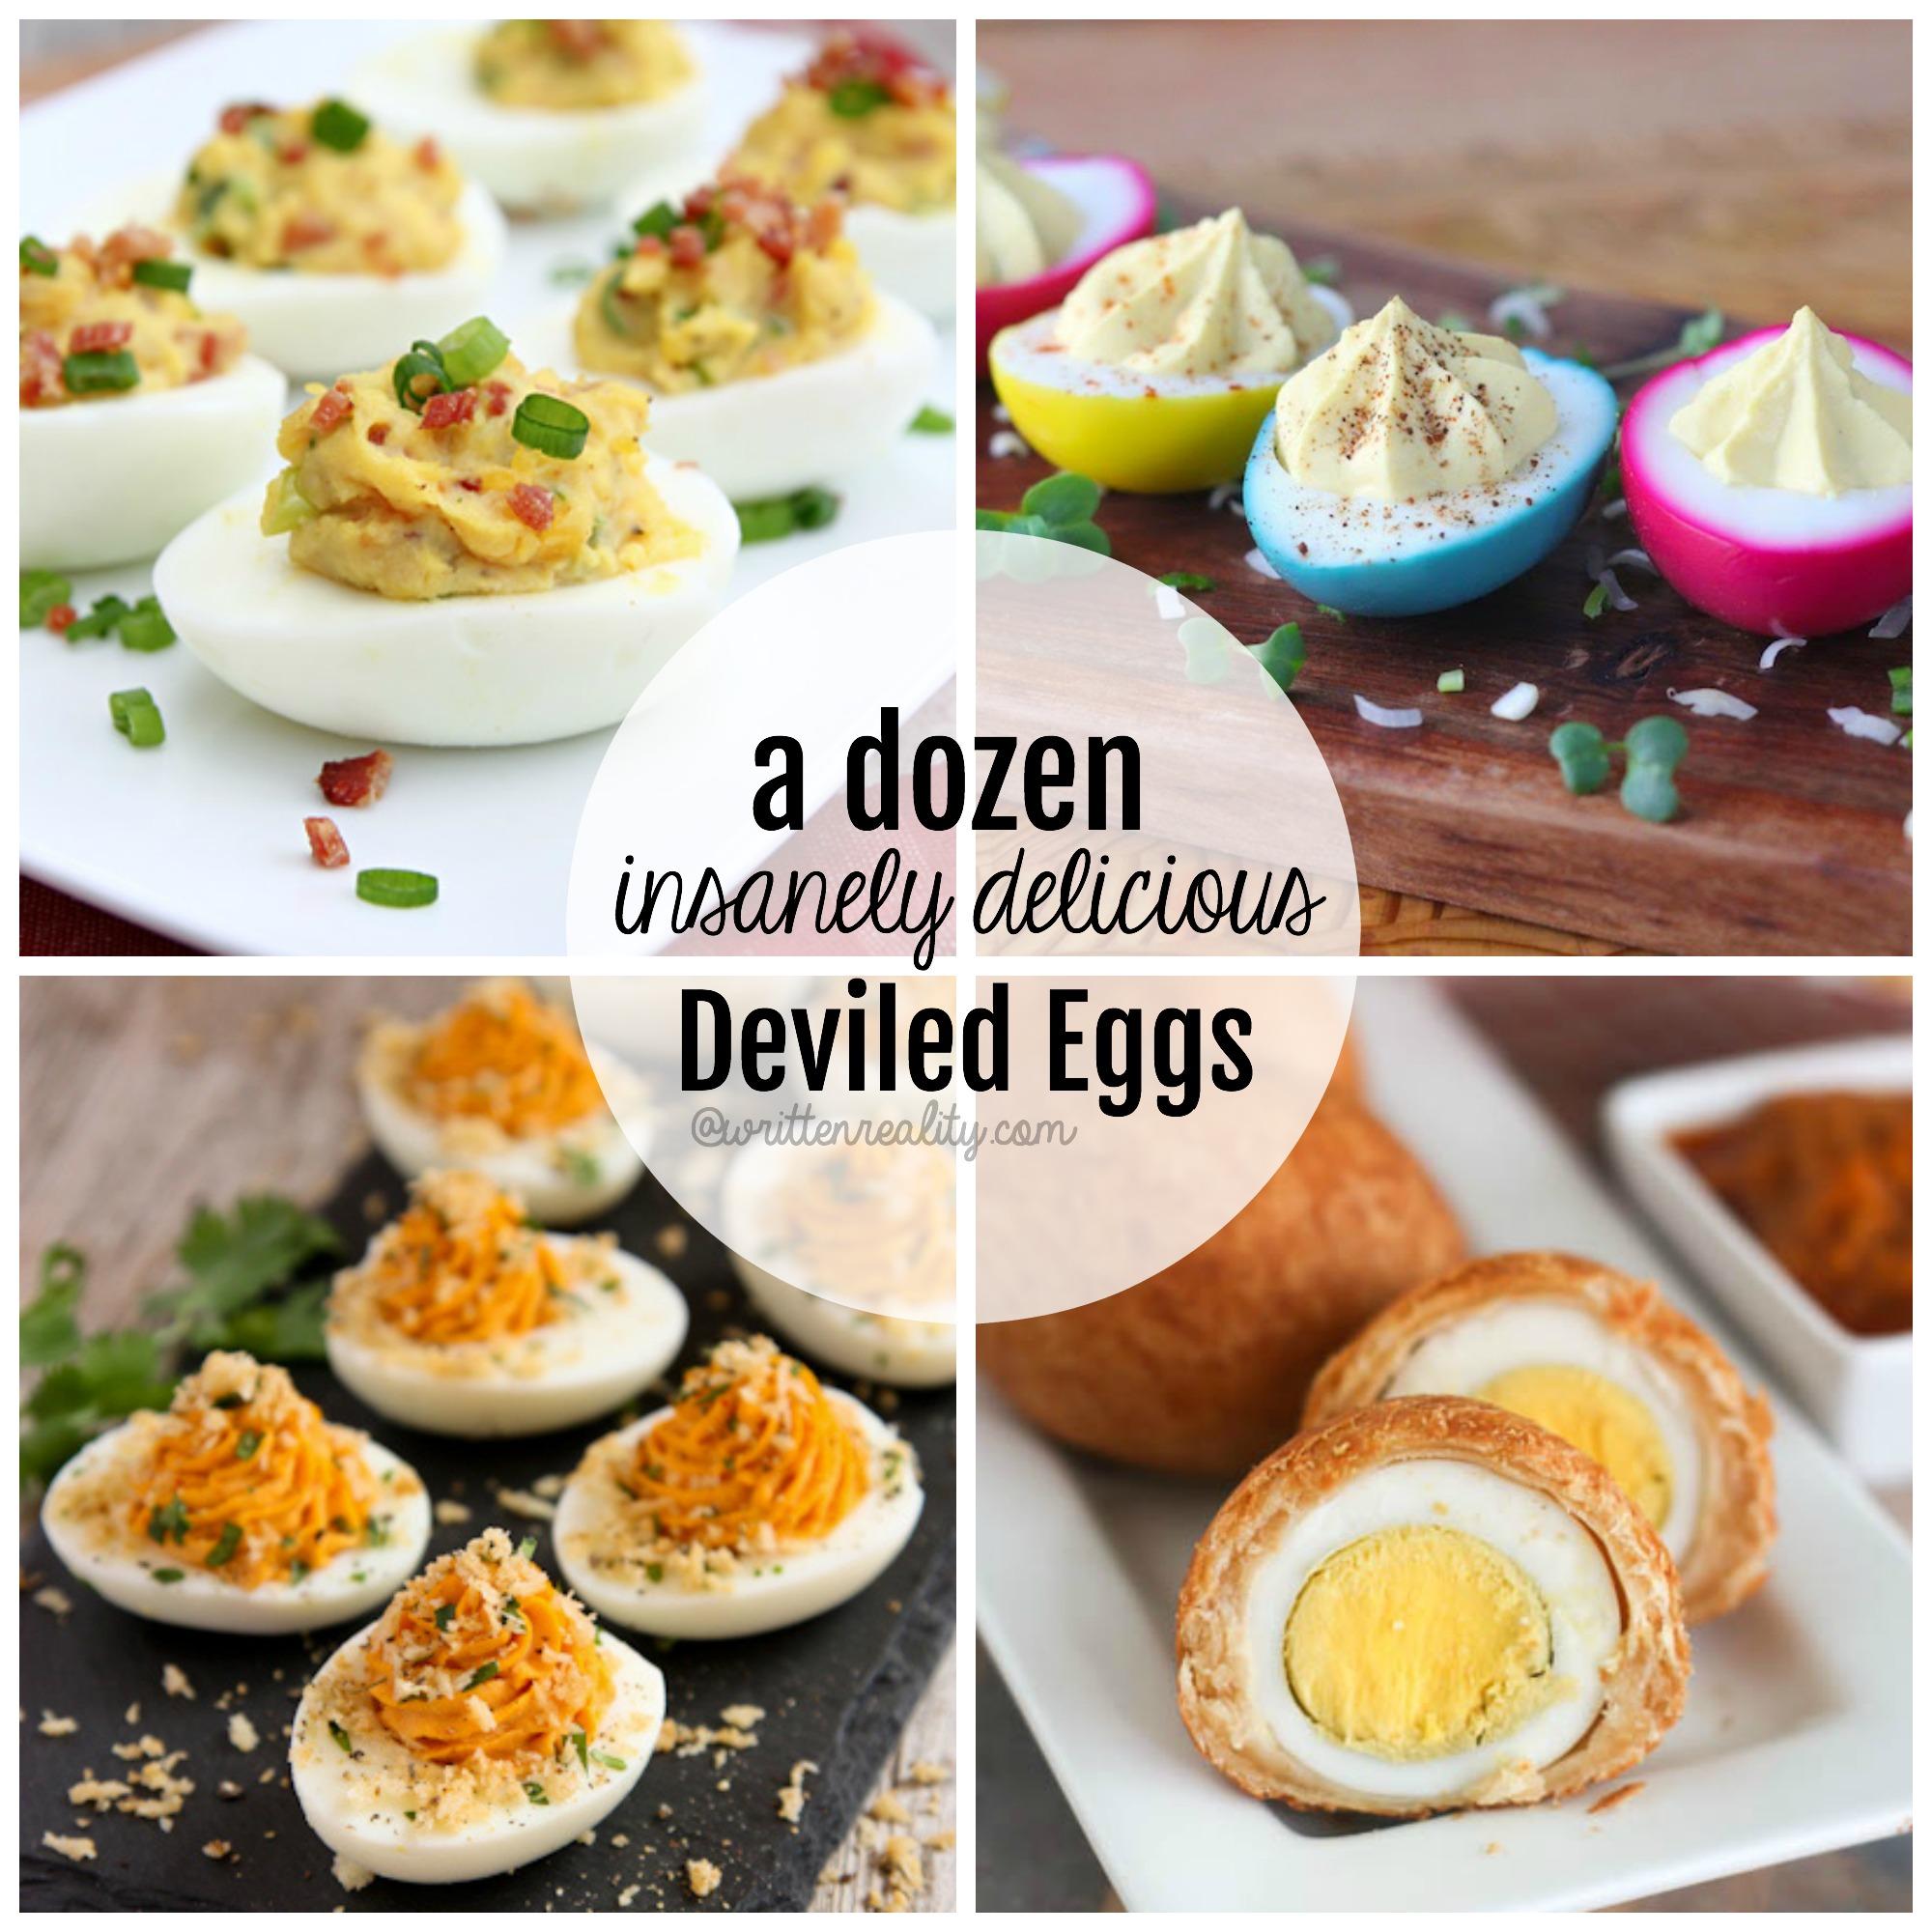 A Dozen Insanely Delicious Deviled Eggs Recipes